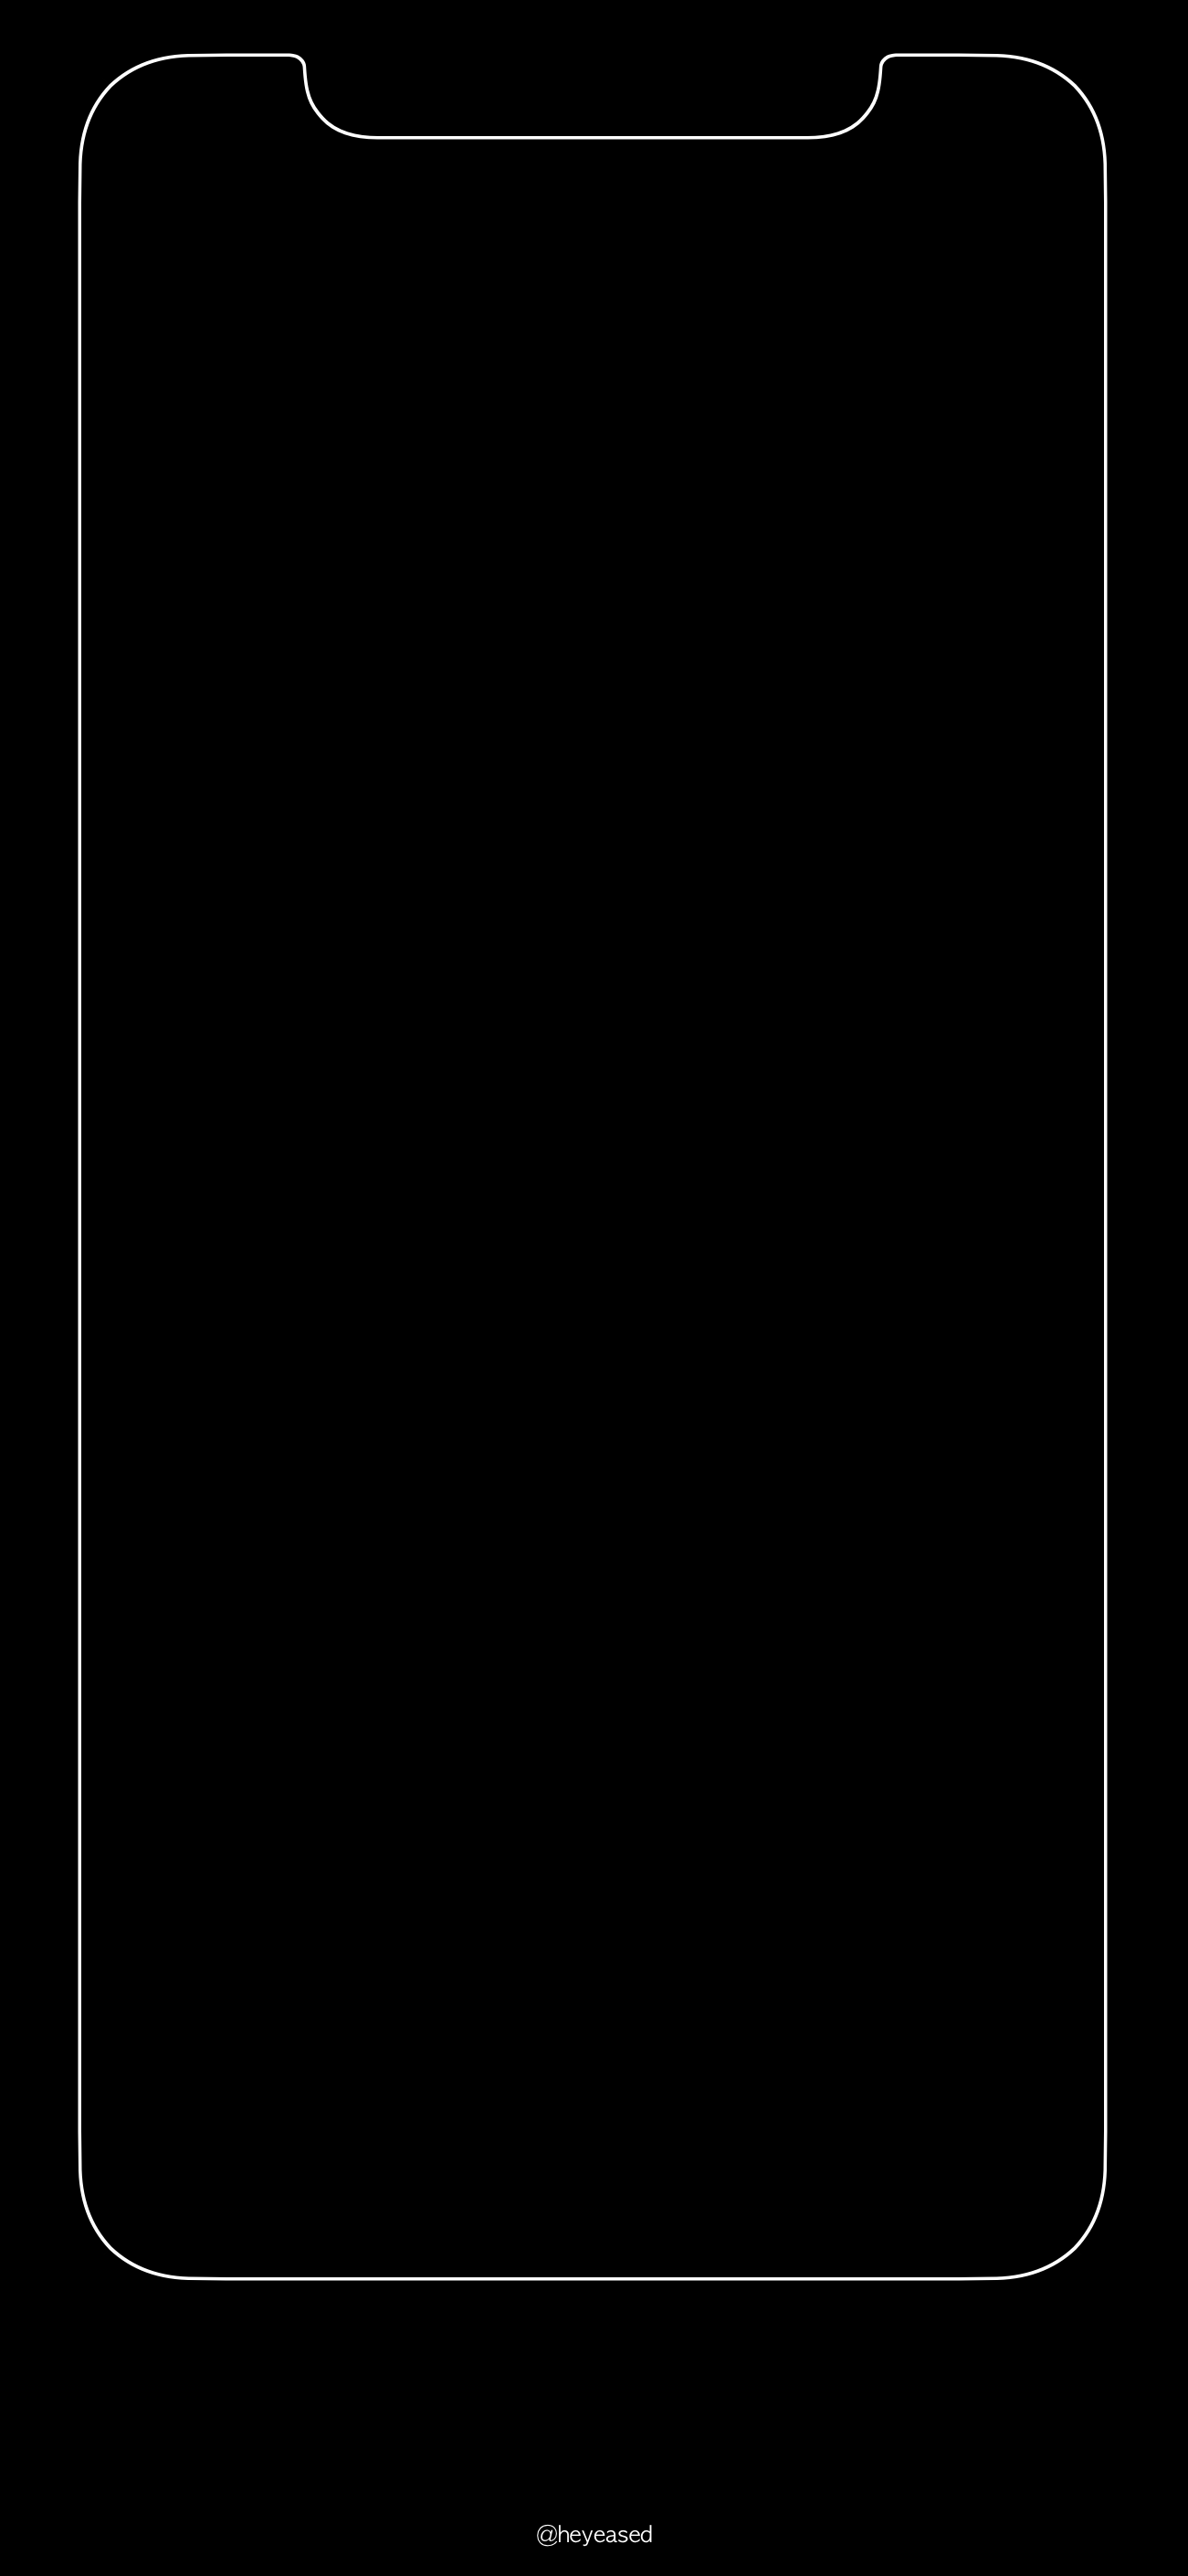 Fondo De Pantalla Para Iphone X Con Borde Blanco Iluminado Watercolor Wallpaper Iphone Black Wallpaper Iphone Iphone Wallpaper